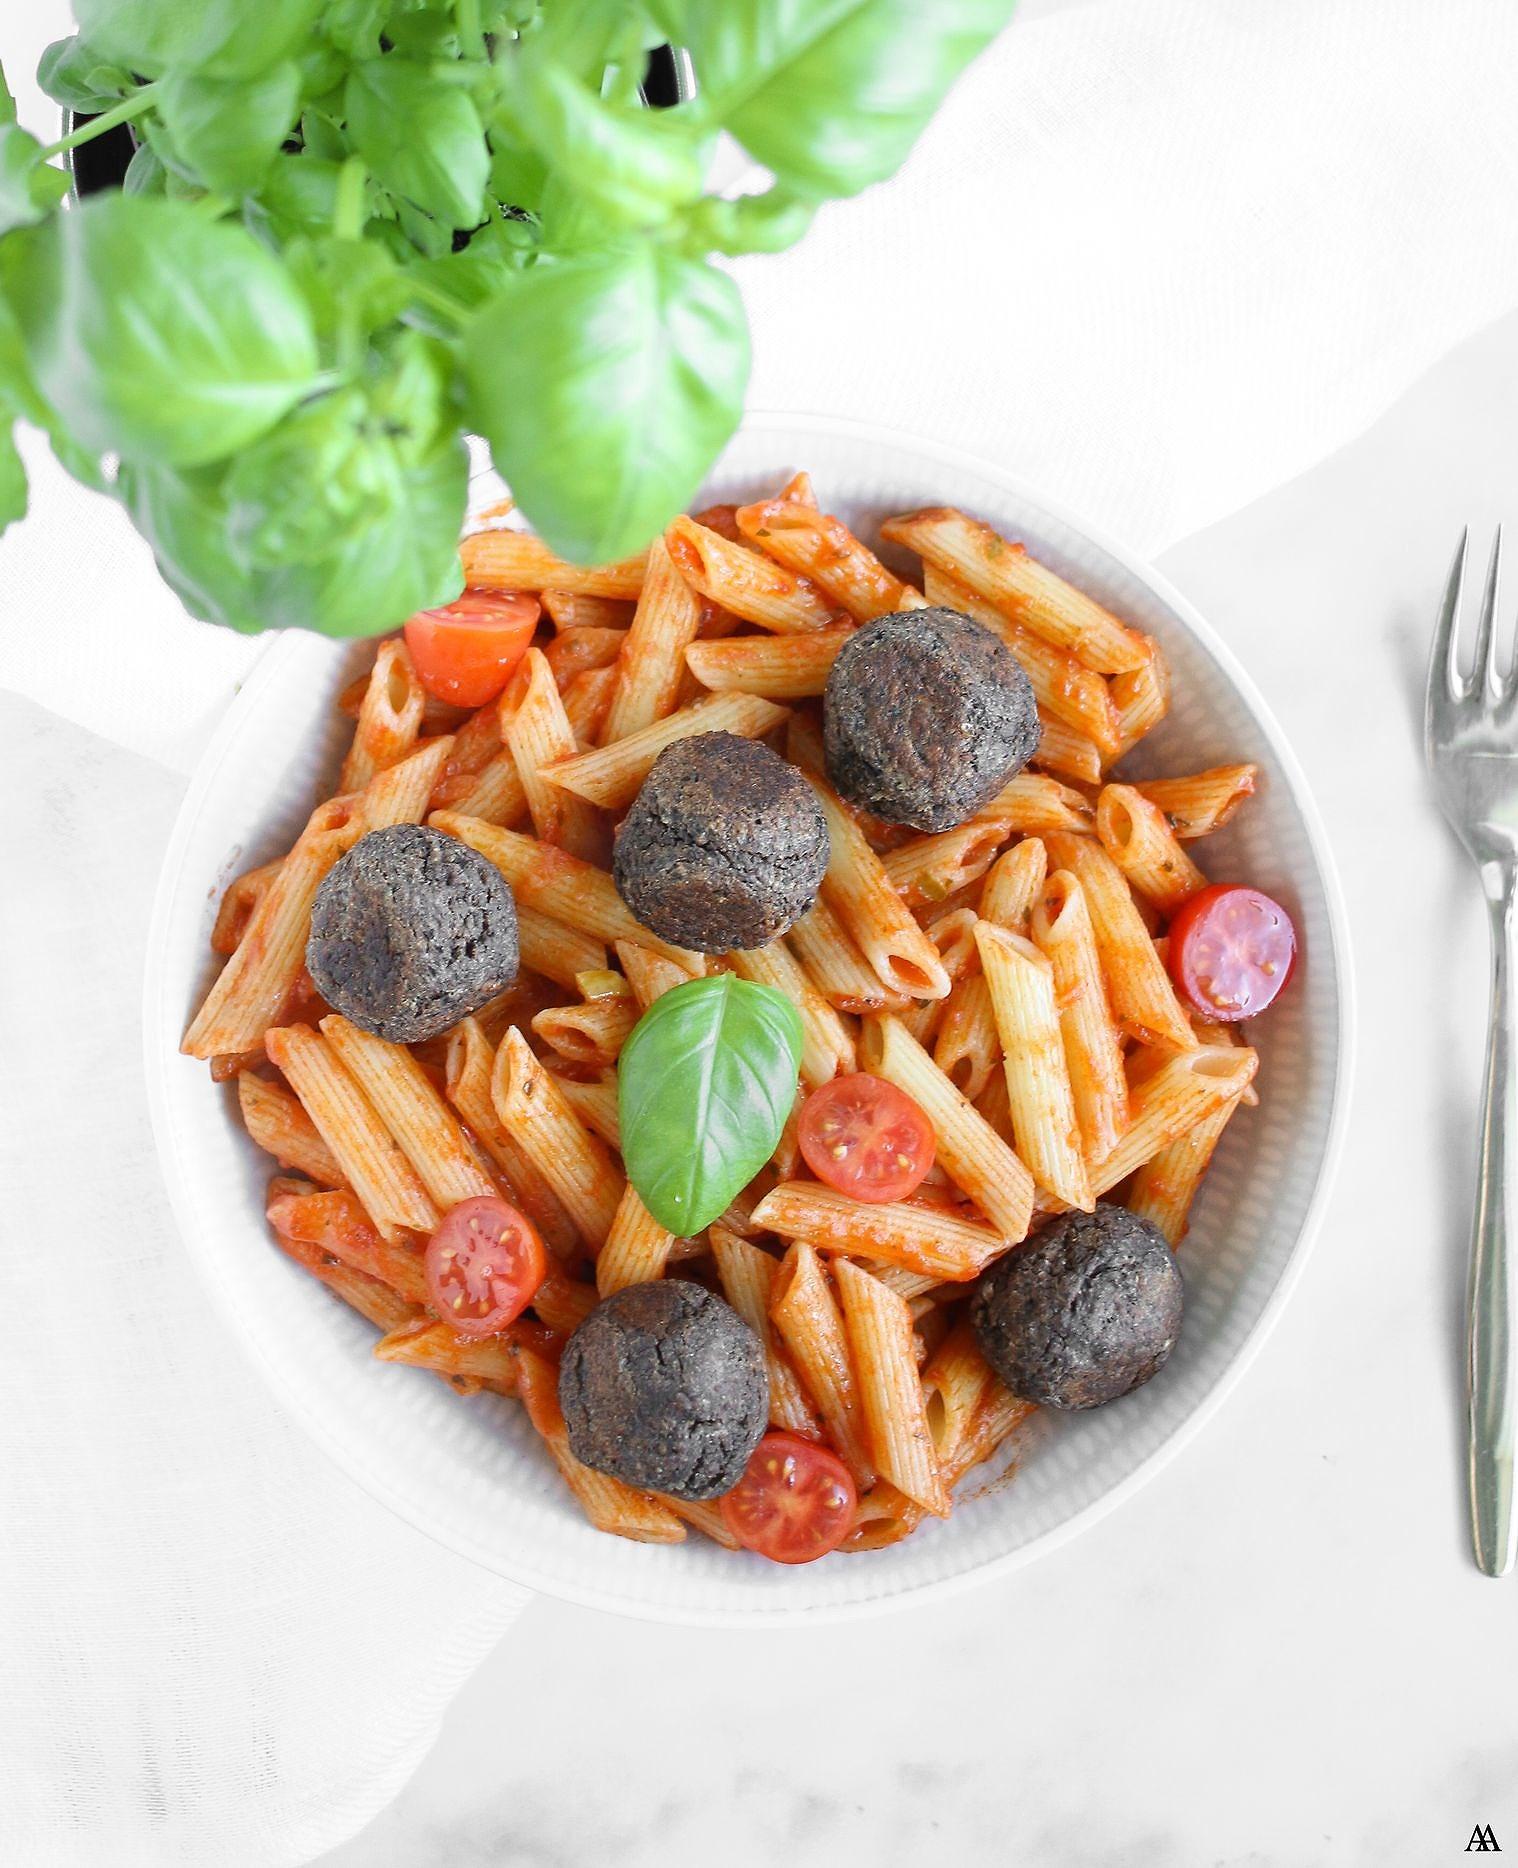 Vegobollar med pasta i tomatsås